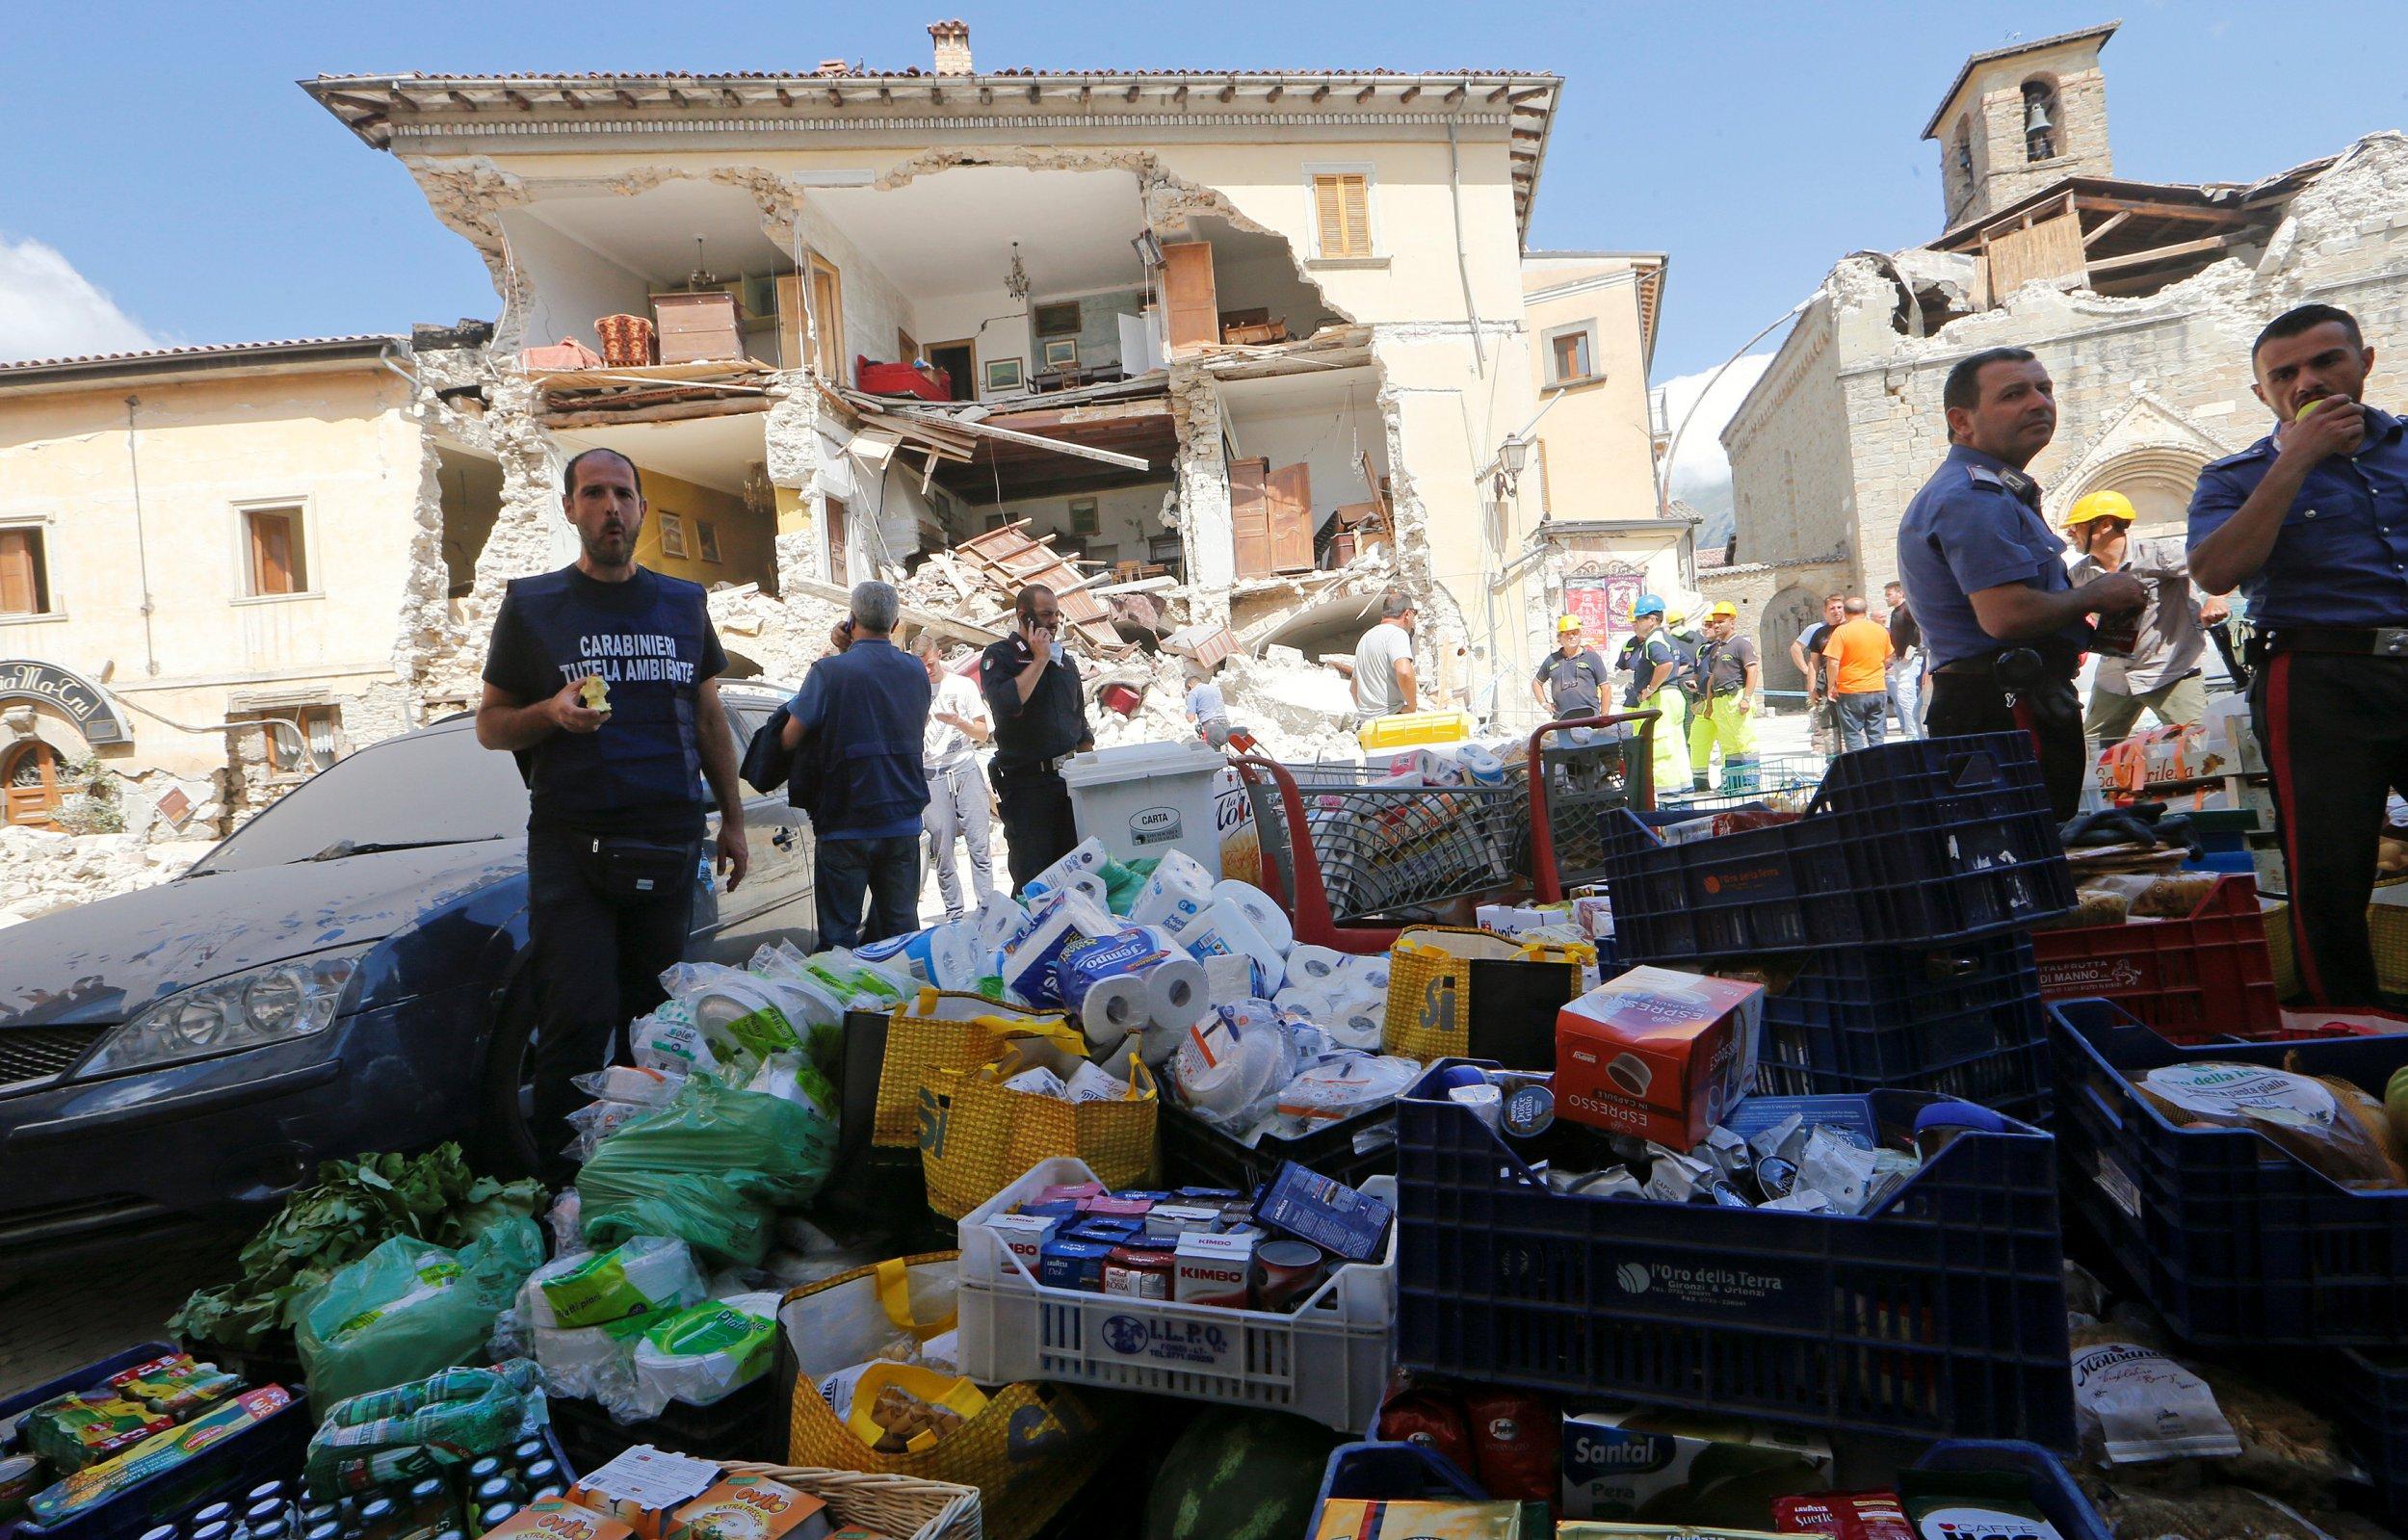 Earthquake in Amatrice